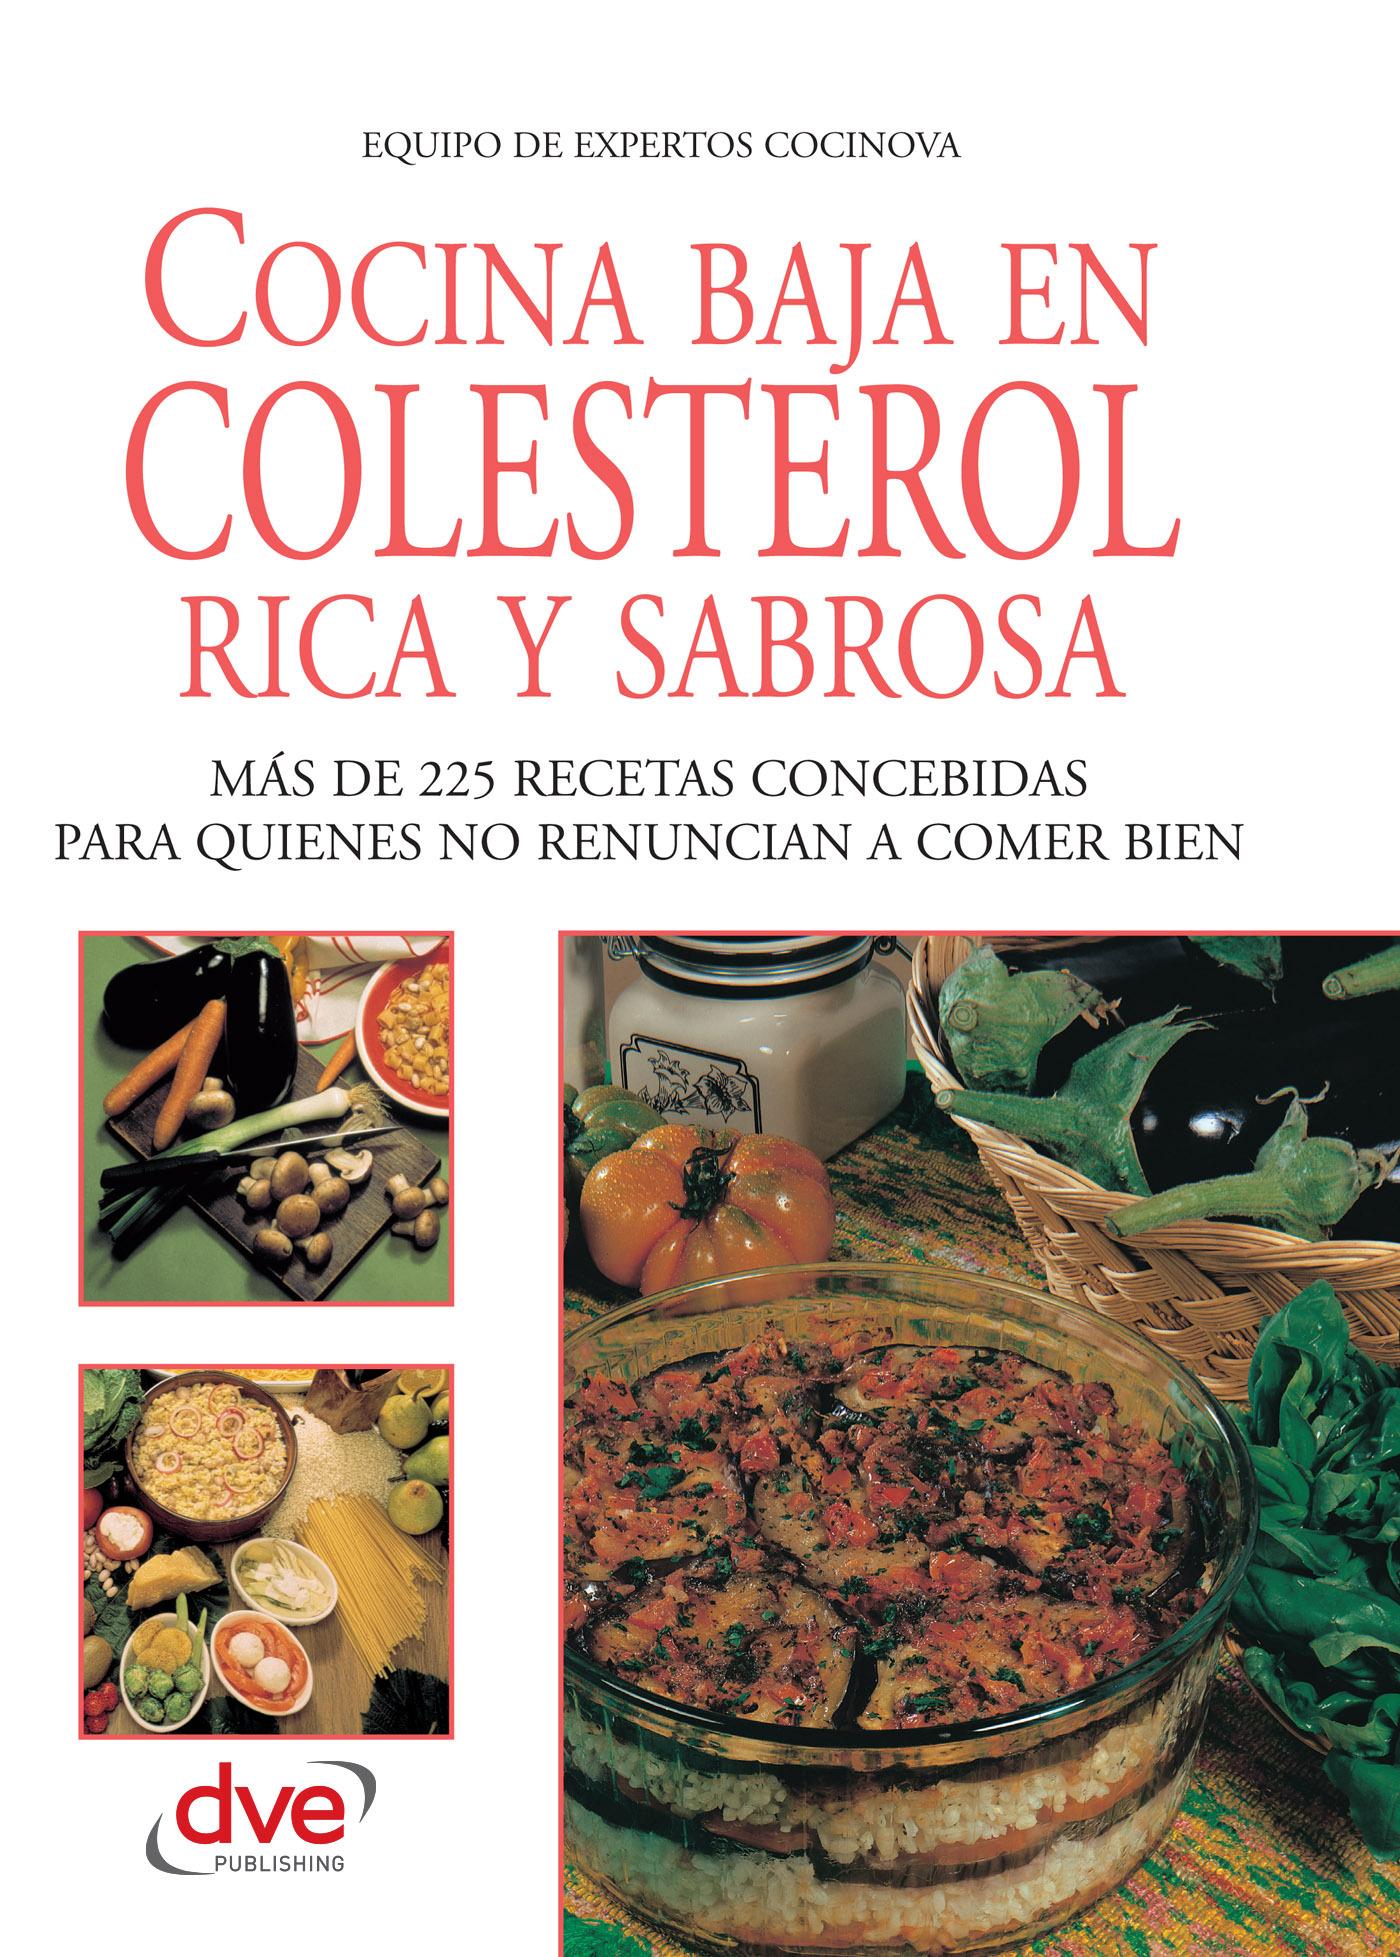 Cocinova, Equipo de expertos Cocinova Equipo de expertos - Cocina baja en colesterol rica y sabrosa, e-bok